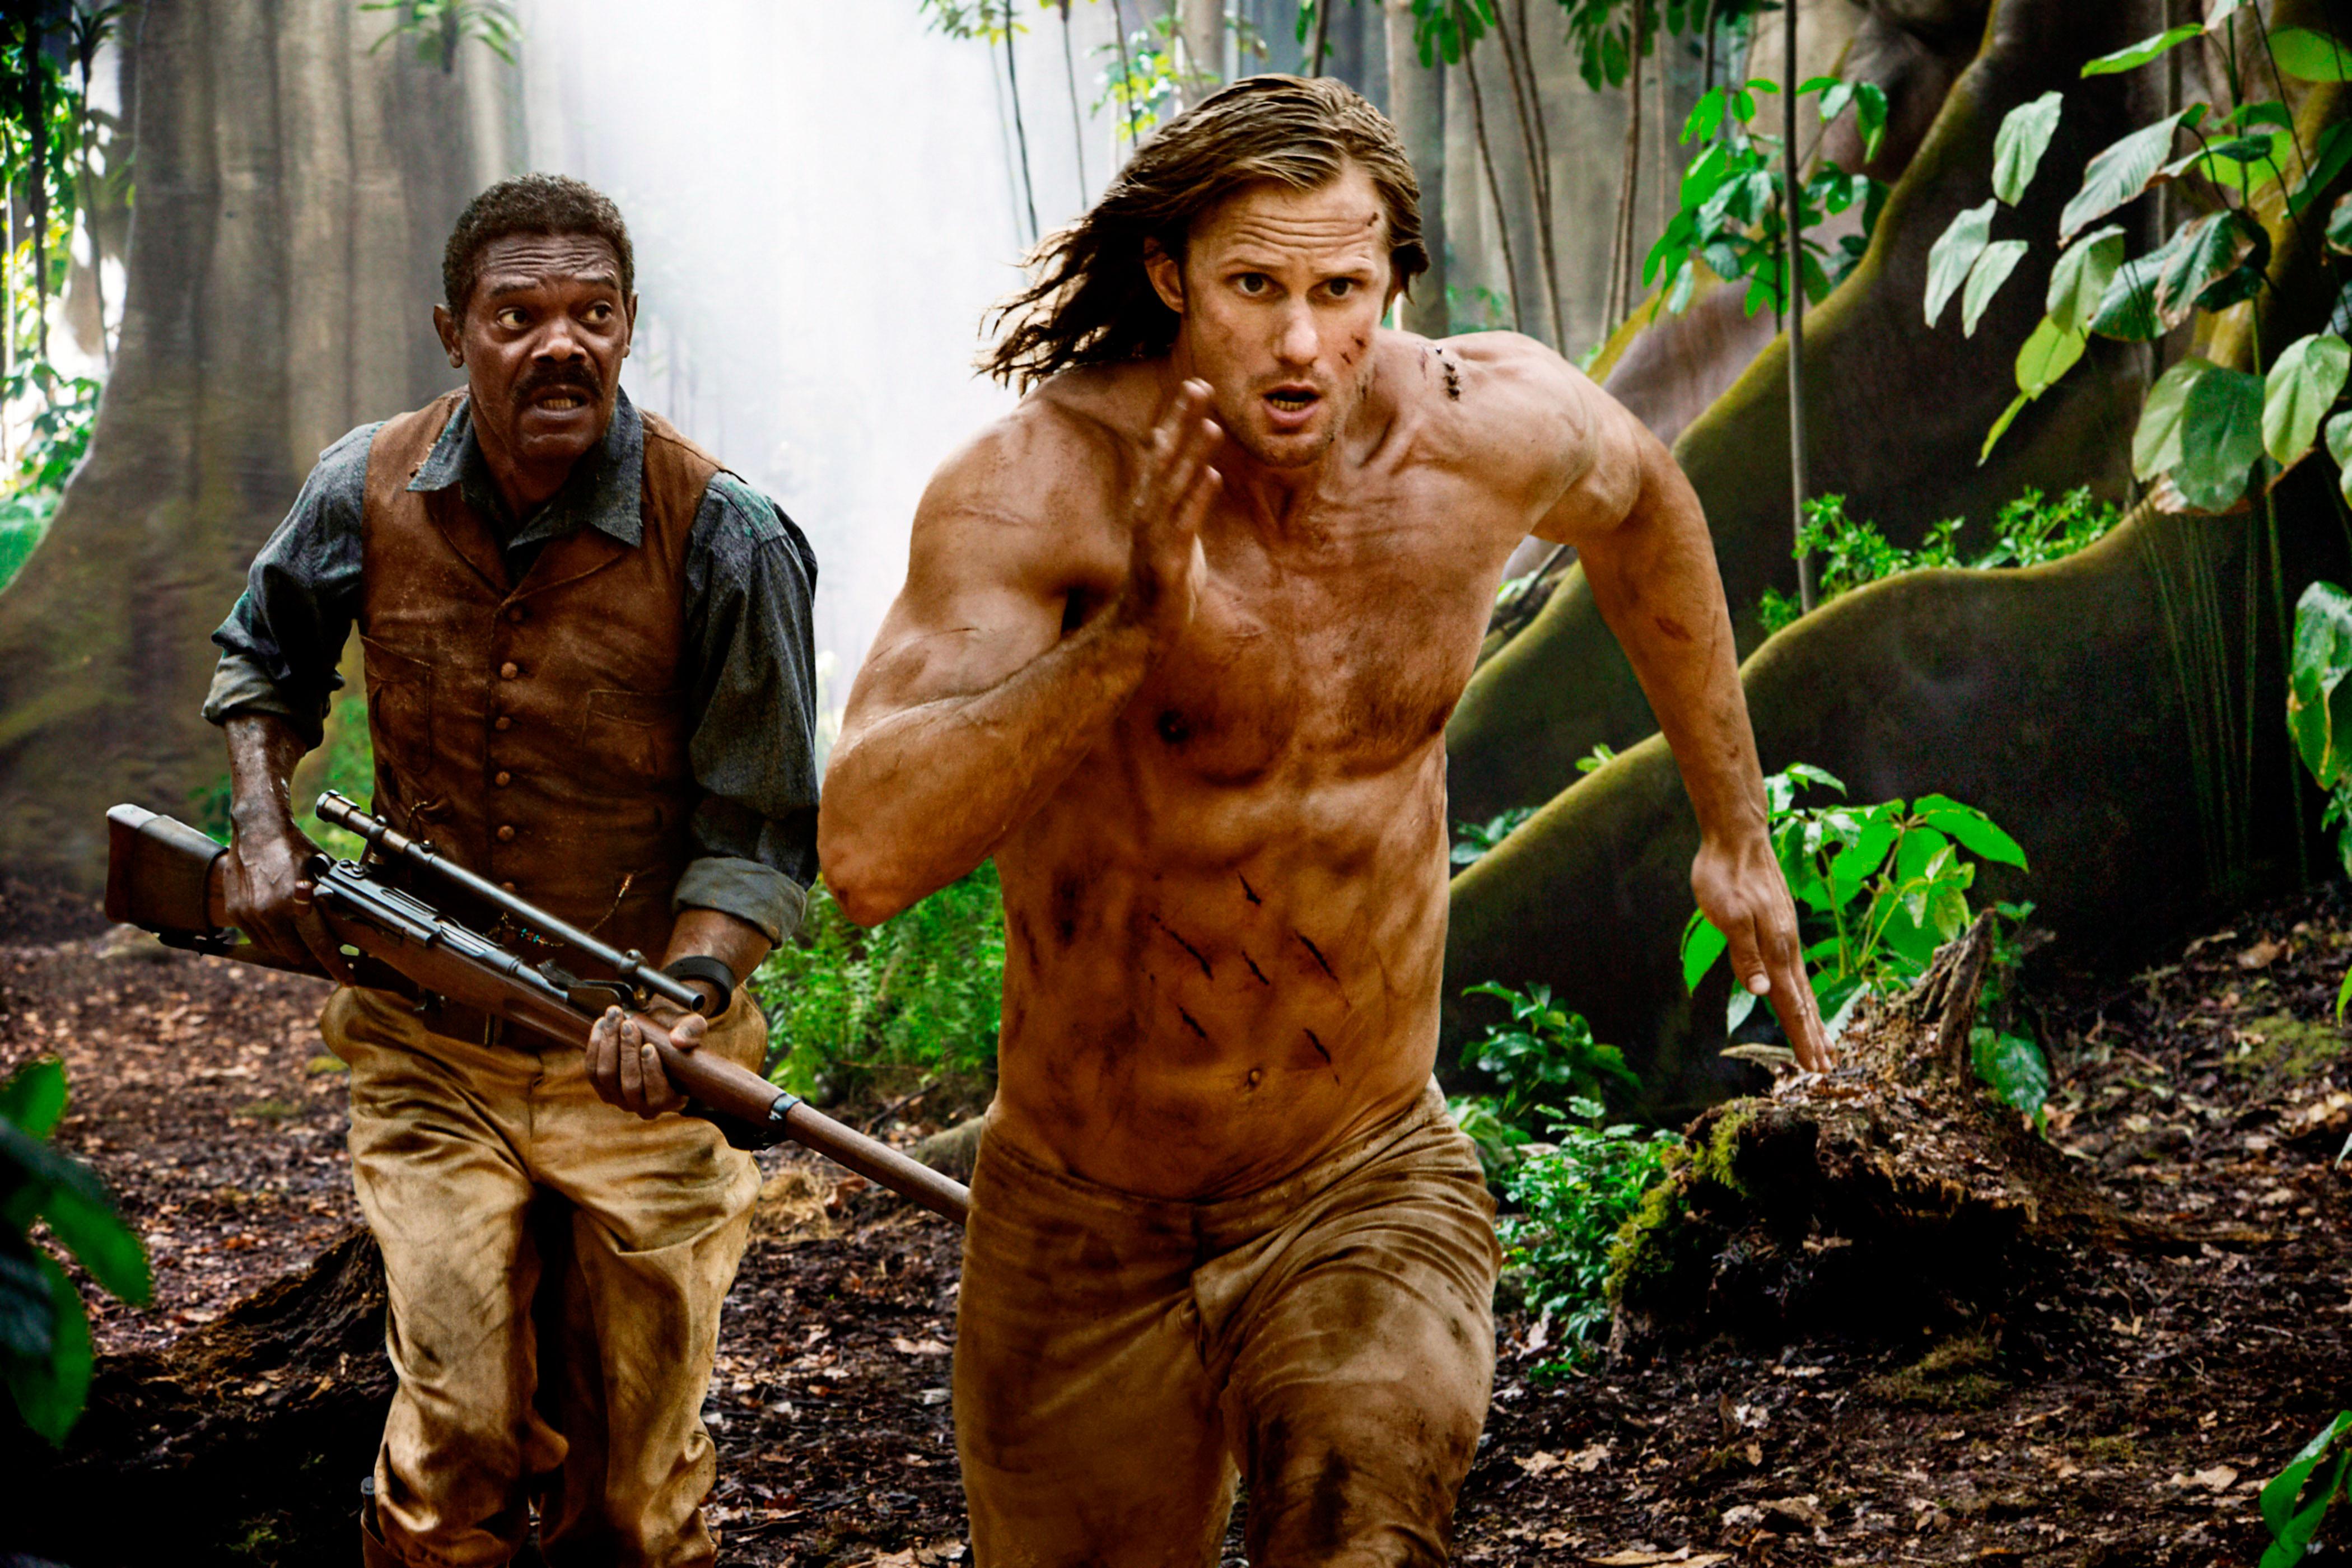 THE LEGEND OF TARZAN, from left: Samuel L. Jackson,Alexander Skarsgard as Tarzan, 2016 ph:Jonathan